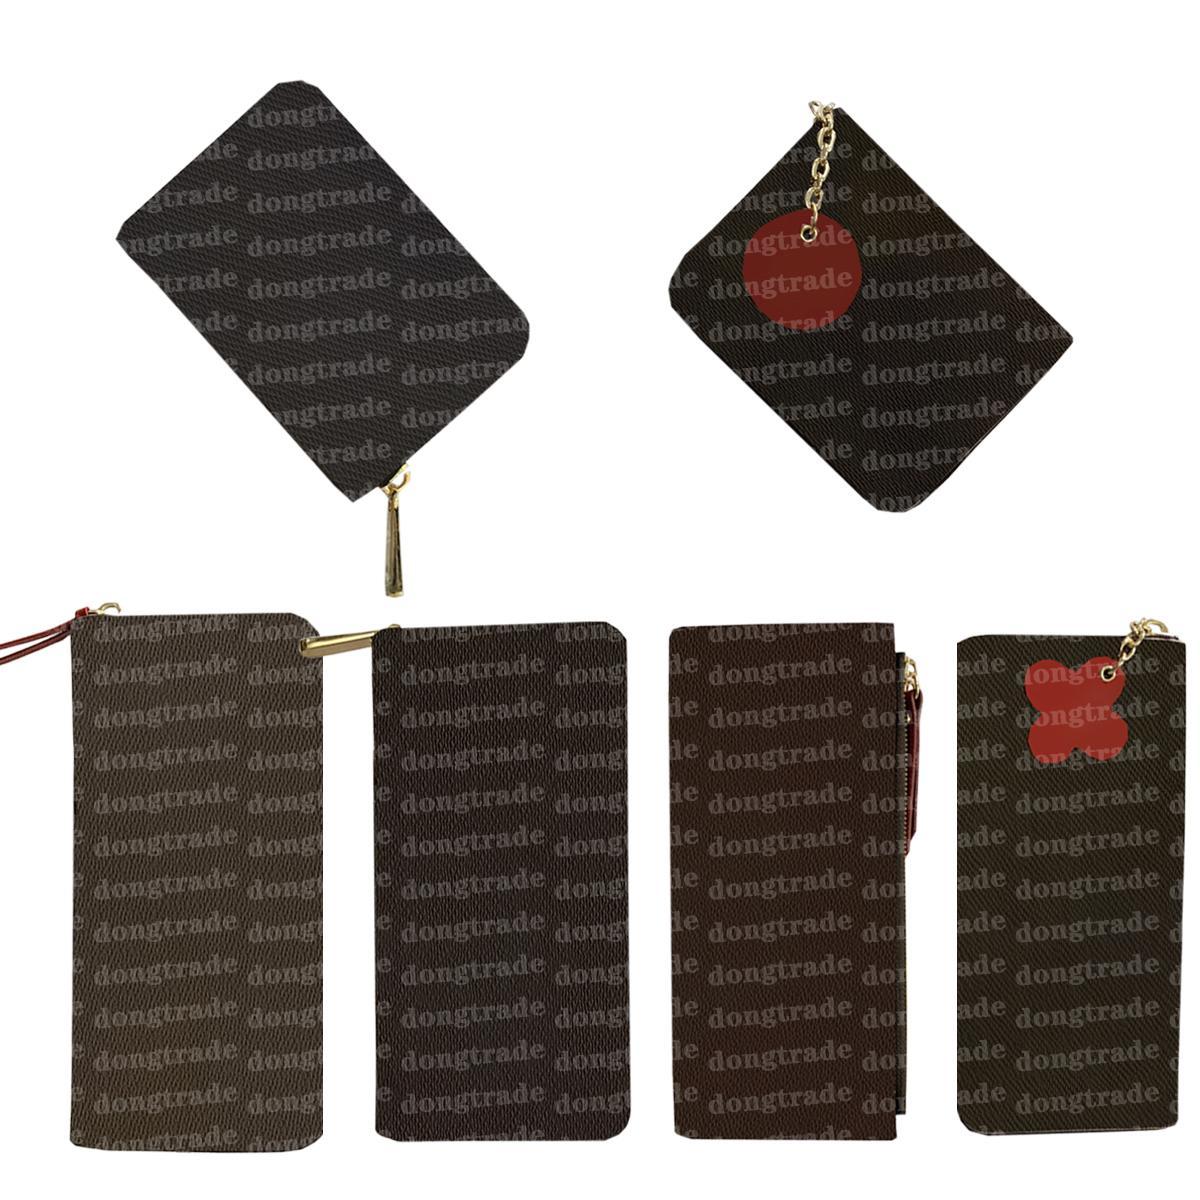 Designer Wallet Long Zippy Coin Purse Match Crossbody Bag Flower Pocket Wallets Short Key Bags Phone Mini Designers Womens Handbags Purses Card Holder